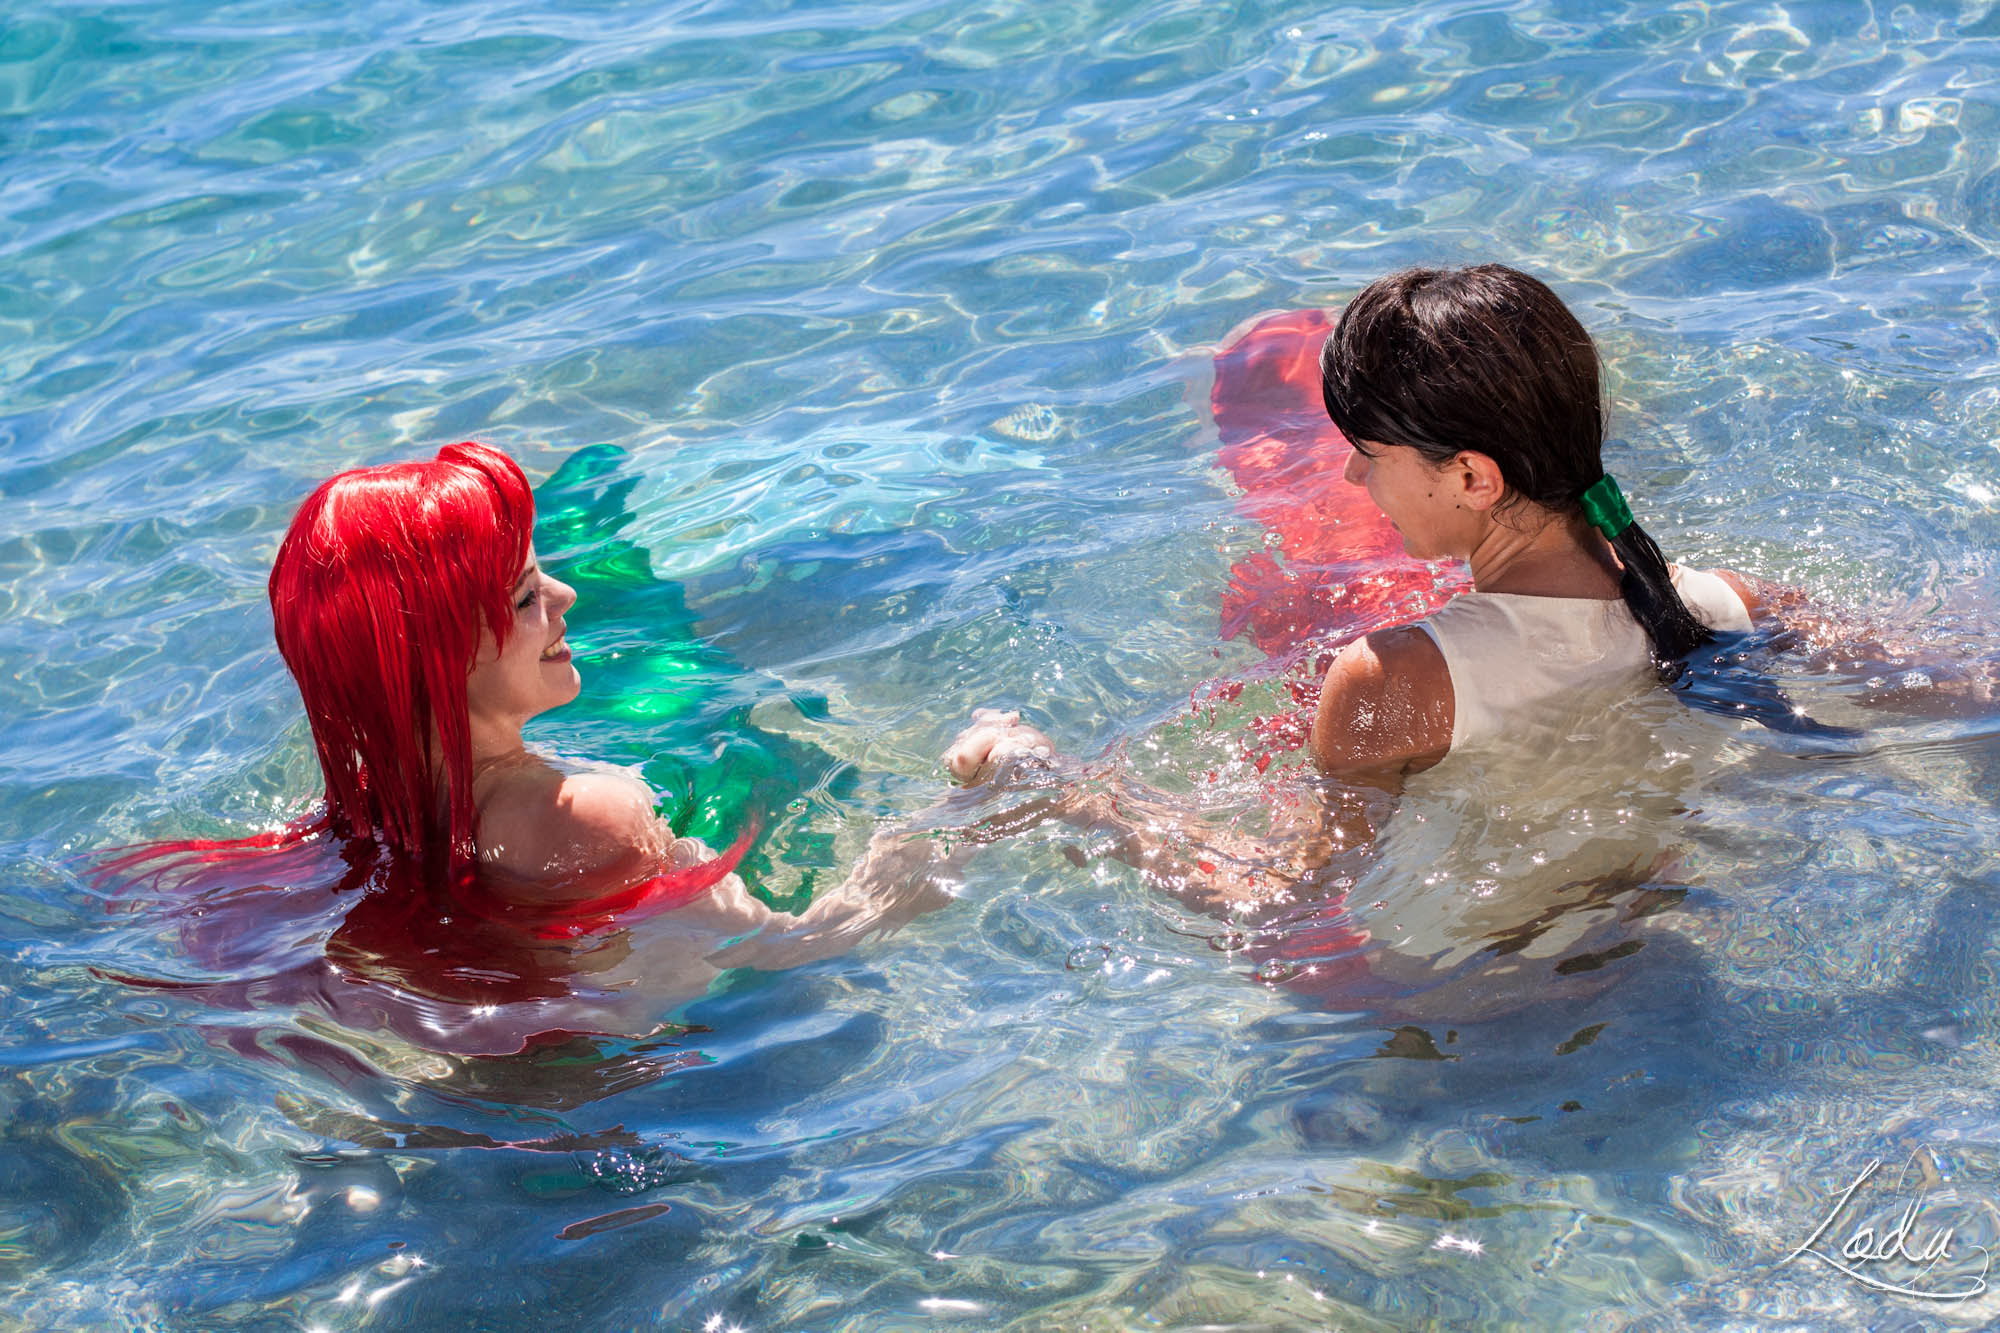 The Little Mermaid 2 by Erendrym on DeviantArt